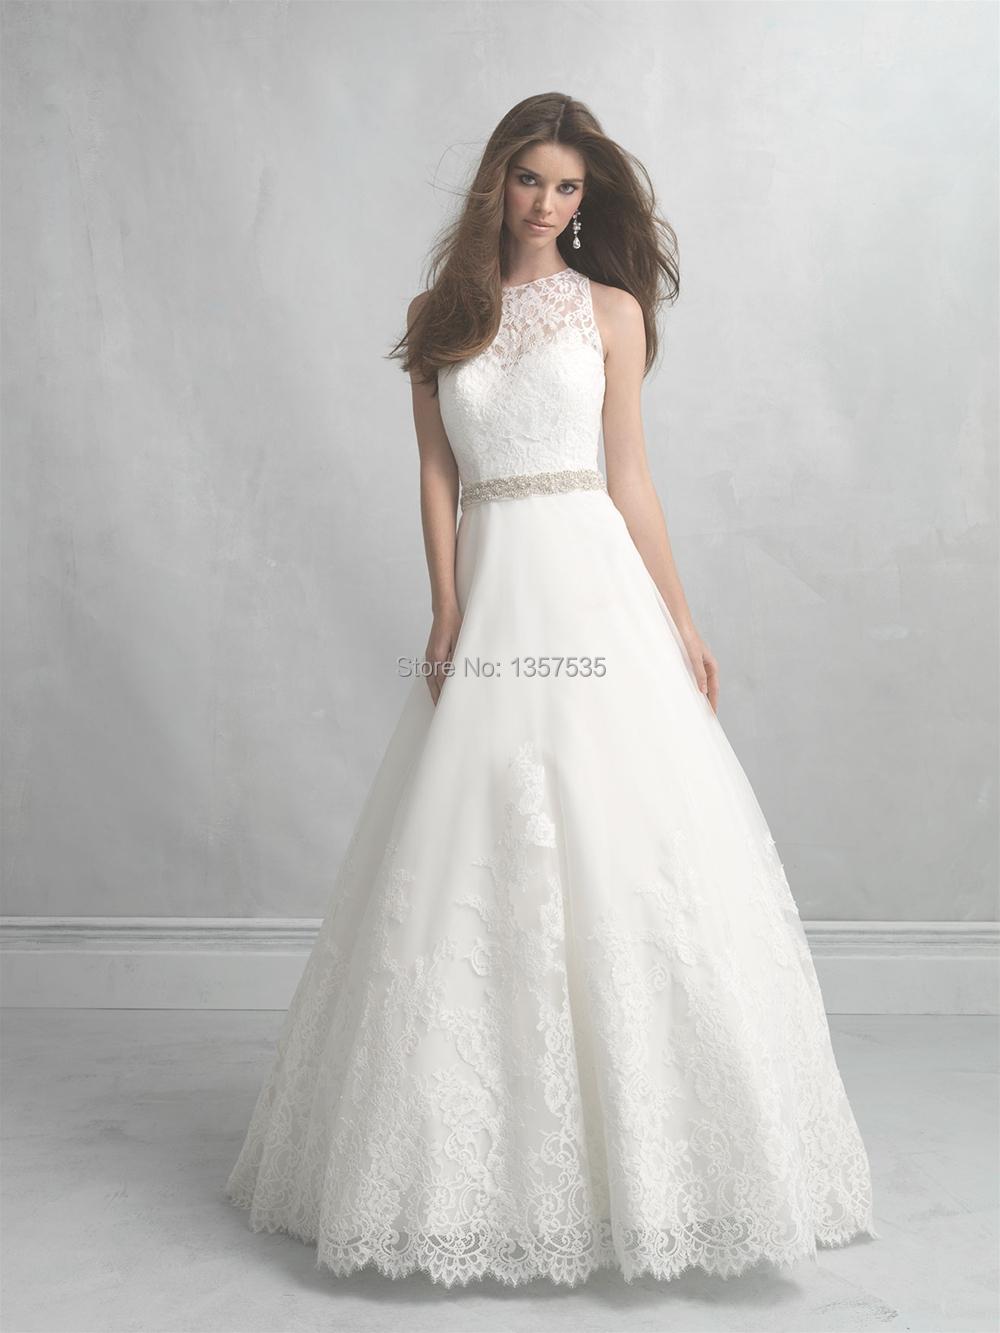 Wedding Dress Lace Cut Out Back : A line wedding dresses tank abiti da sposa beading